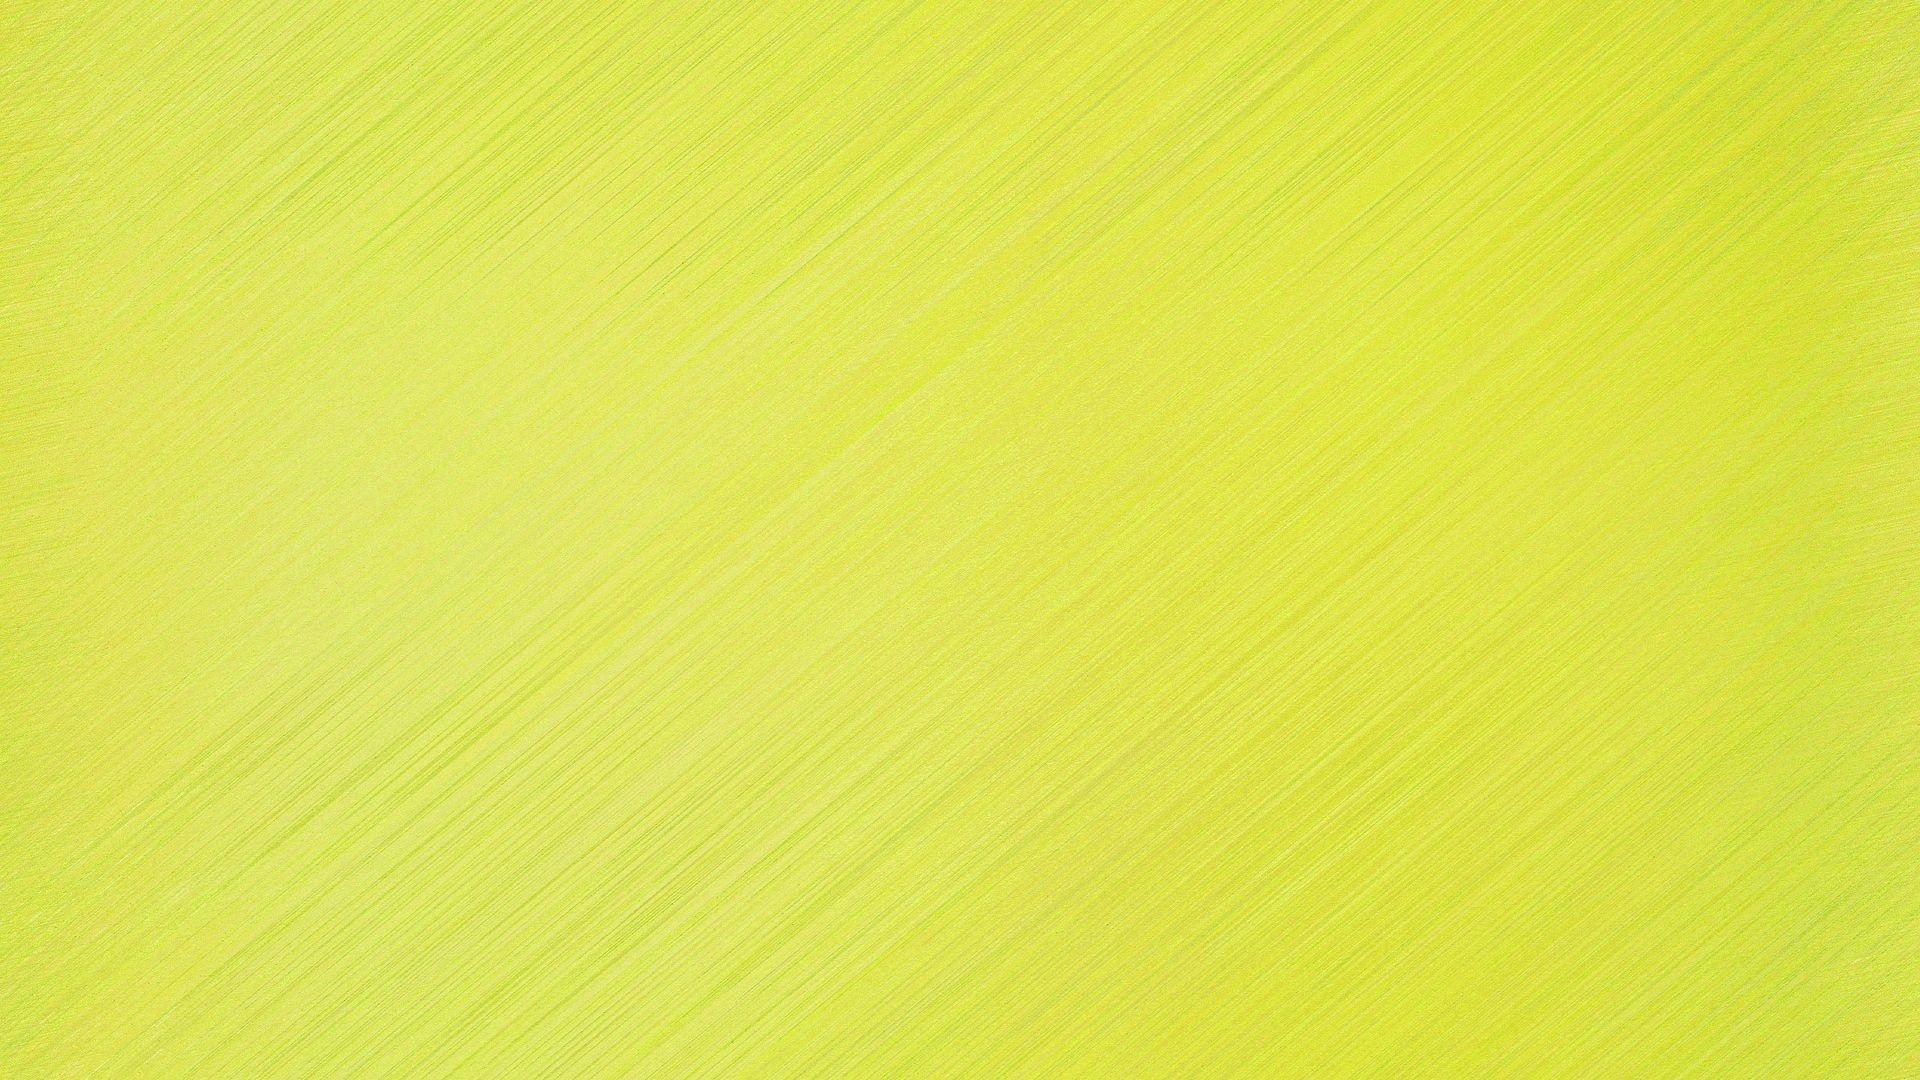 Wallpaper Texture, pattern, fabric, yellow